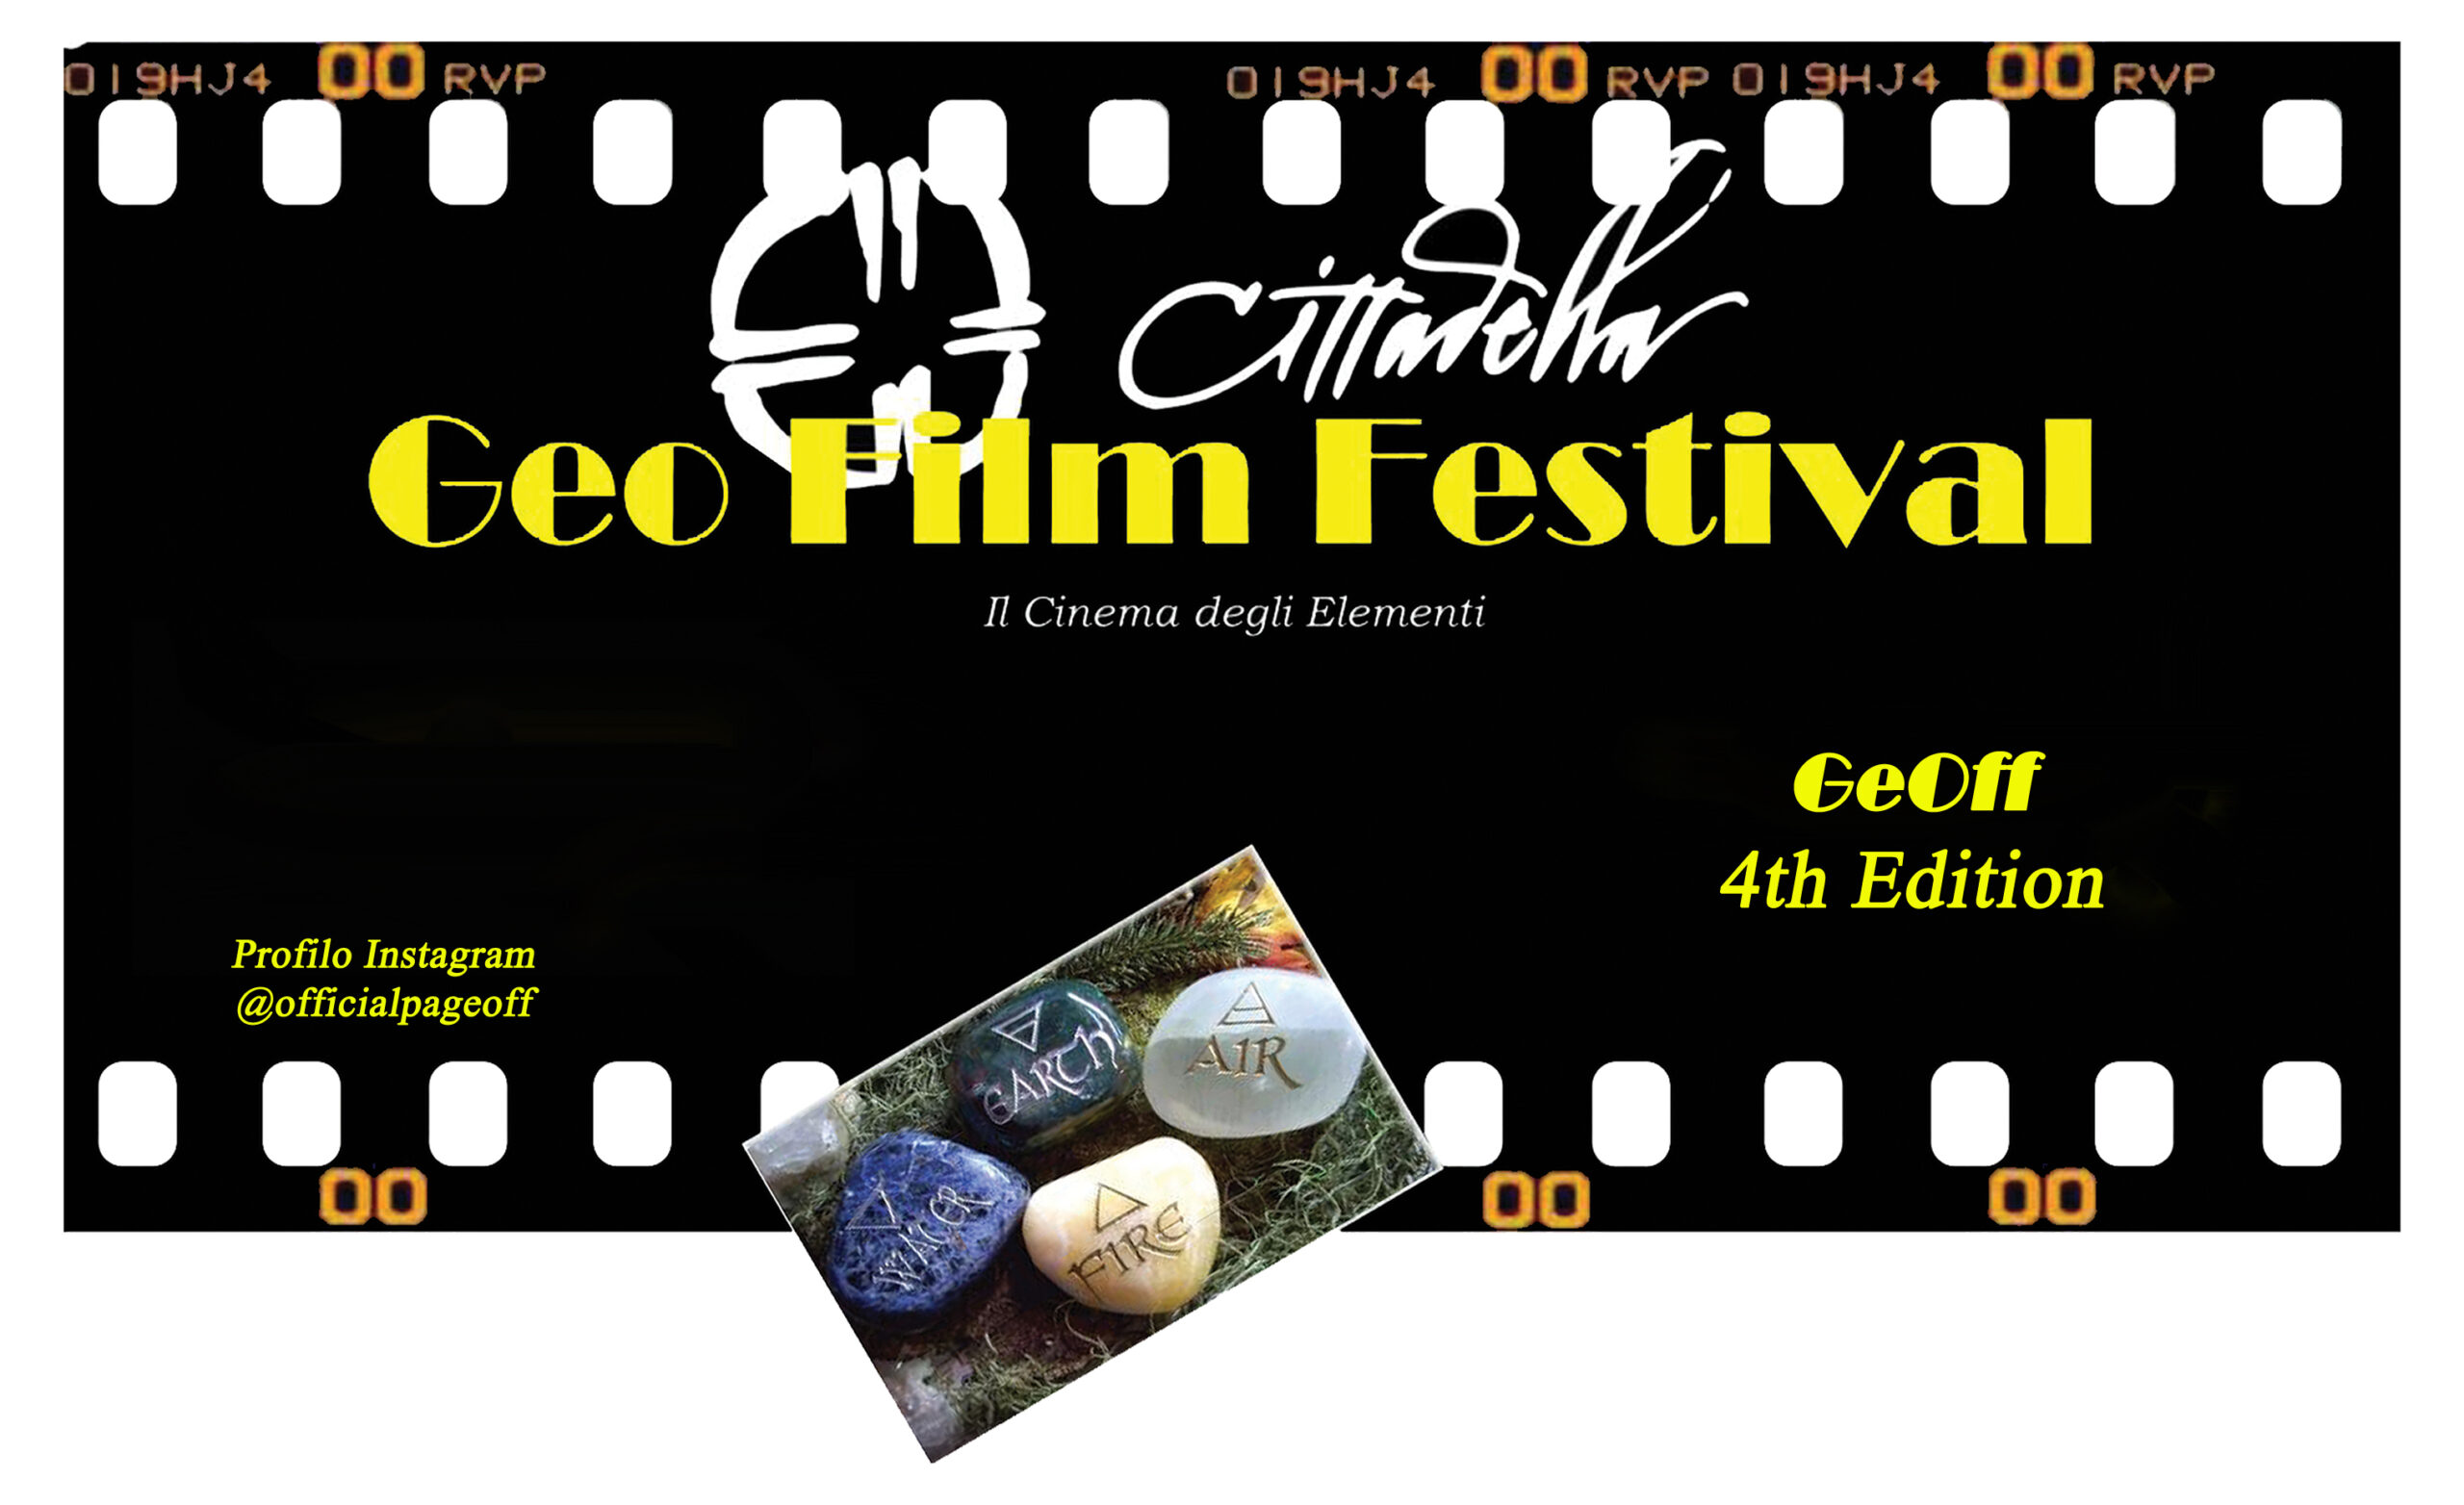 GeOFF – CittadellaGeoFilmFestival Premio Golden Earth e Targa Cinit – Cineforum Italiano